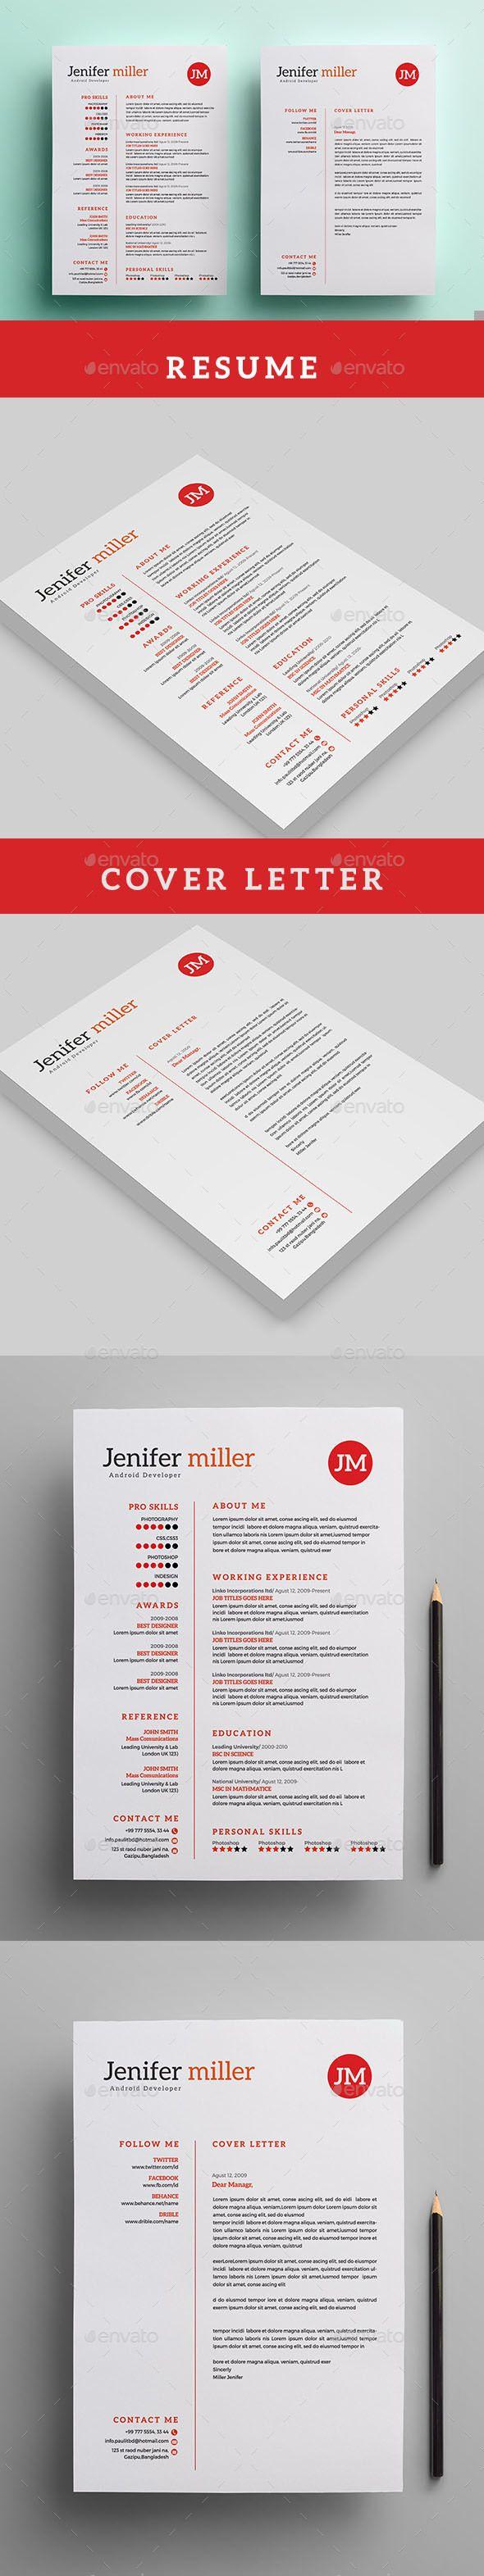 80 best ..NicE cV.. images on Pinterest | Resume templates, Creative ...